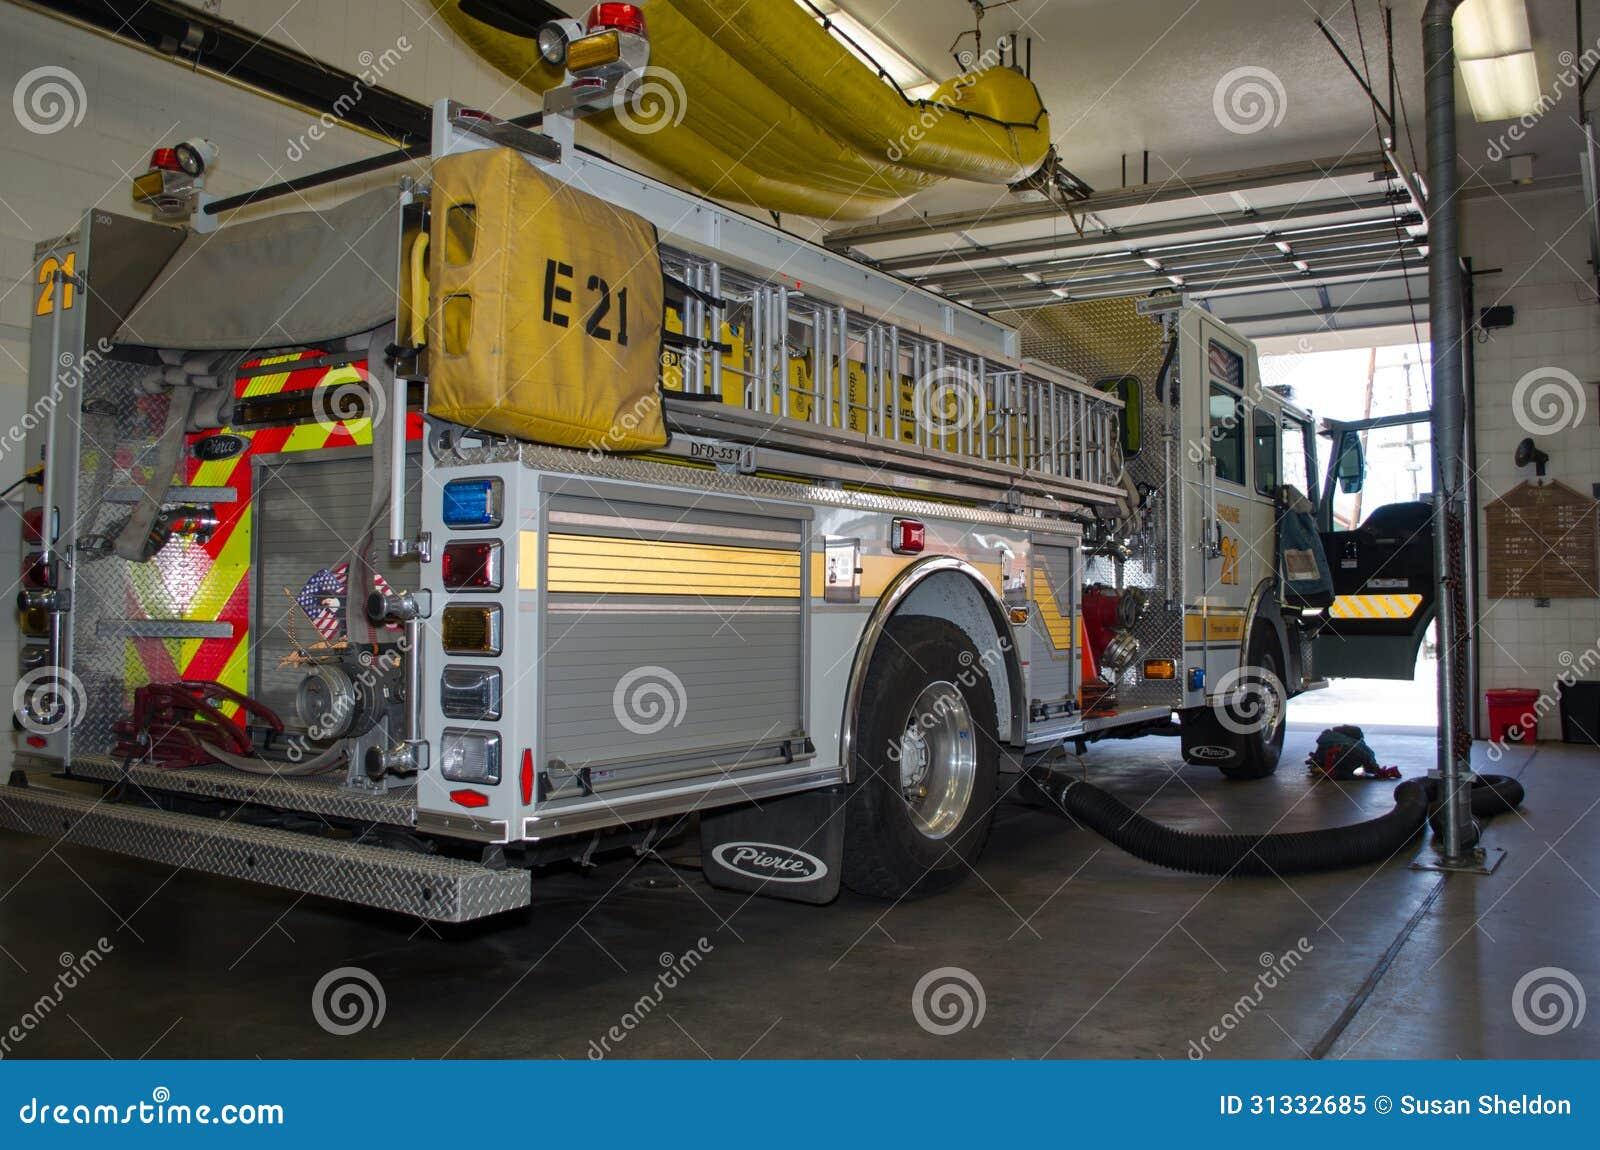 Inside Fire Station   Inside Ambulance   Inside Fire Truck CabInside Ambulance Truck